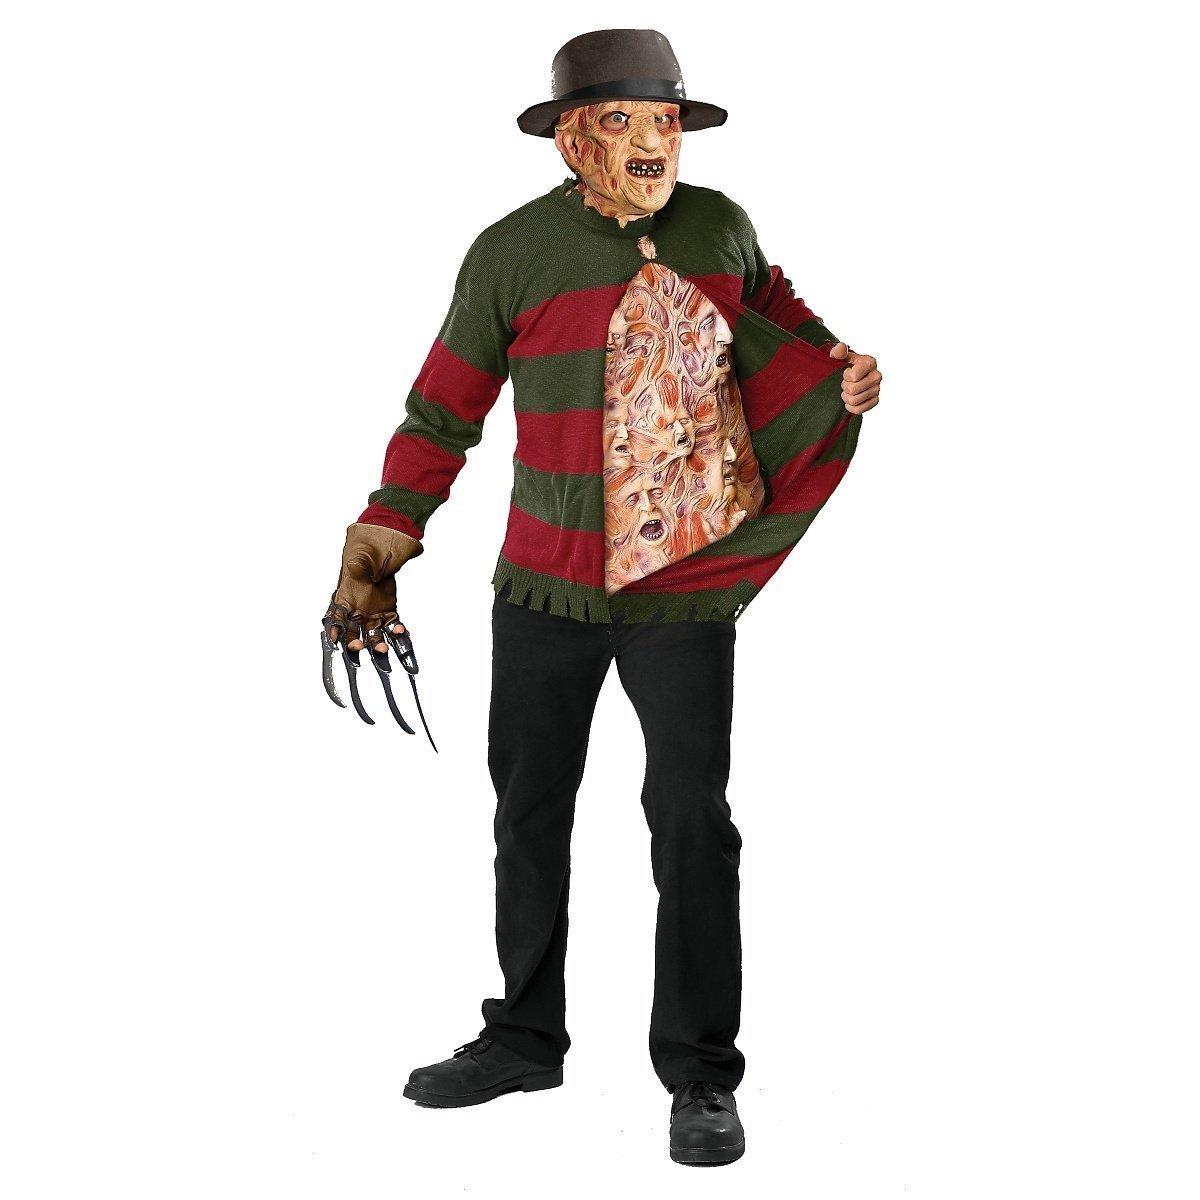 Rubbies - Disfraz de Freddy Kruger para niño, talla única (56066STD)